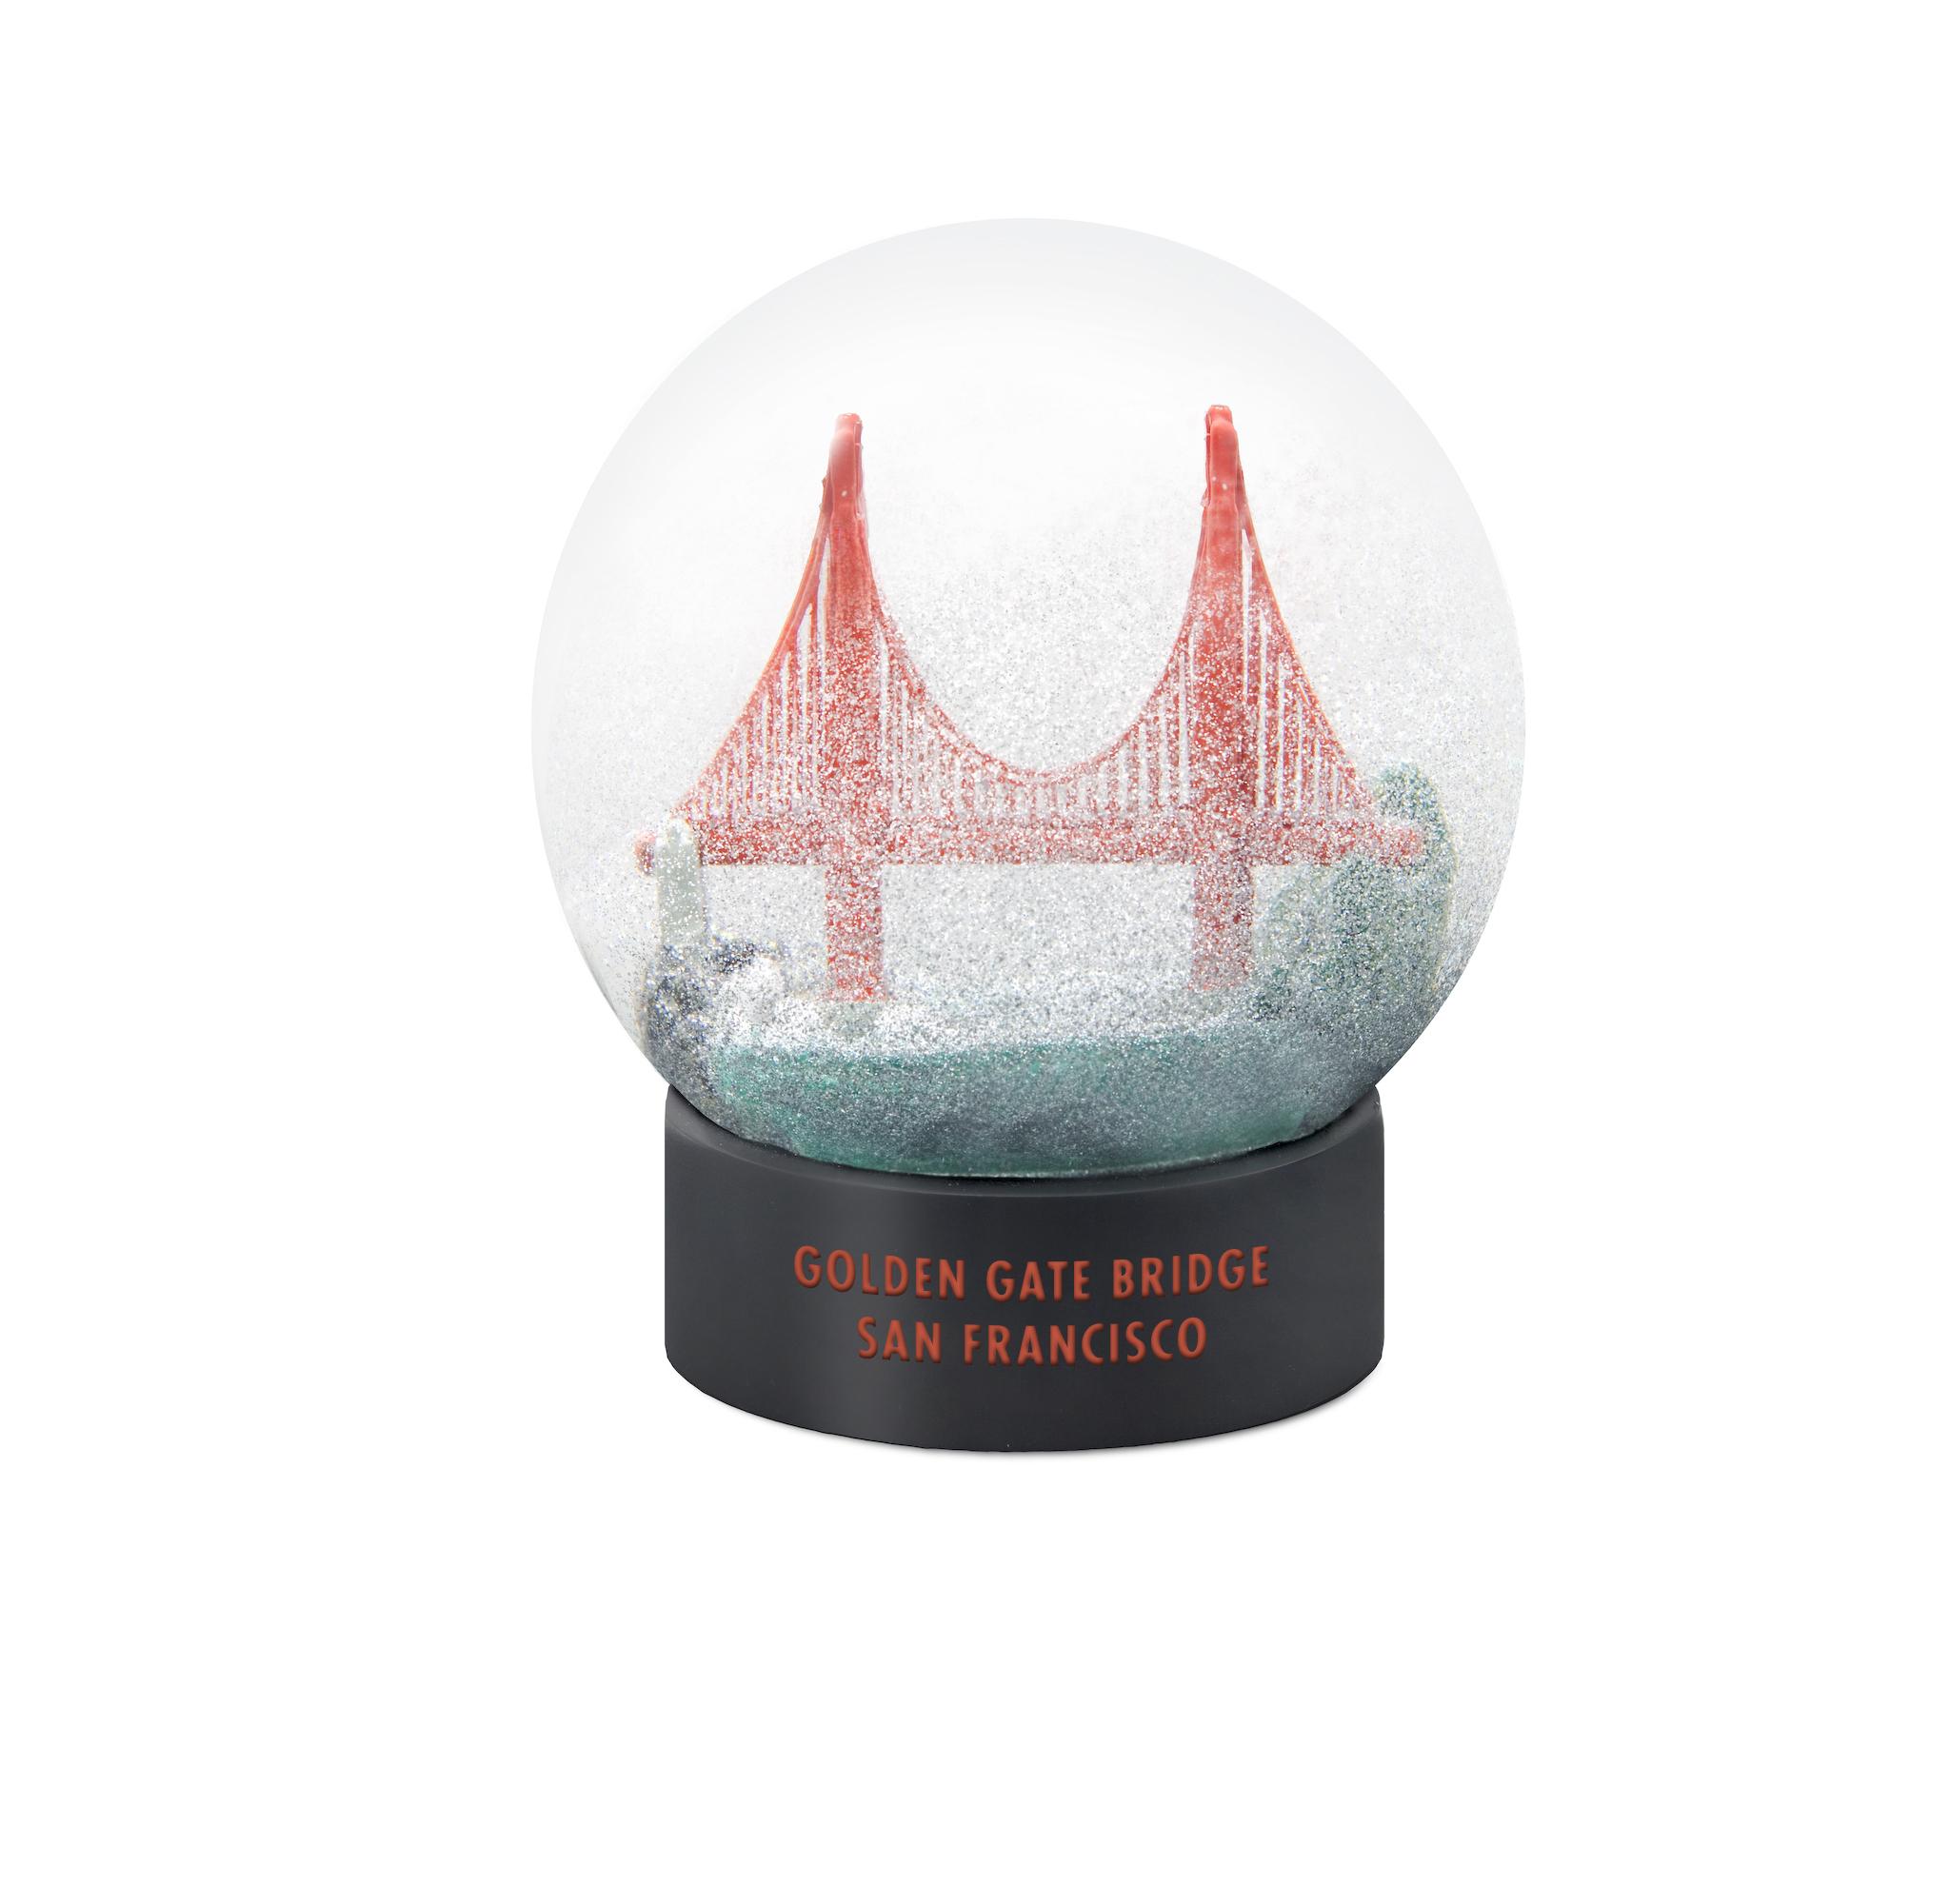 Golden Gate Bridge Fog Globe